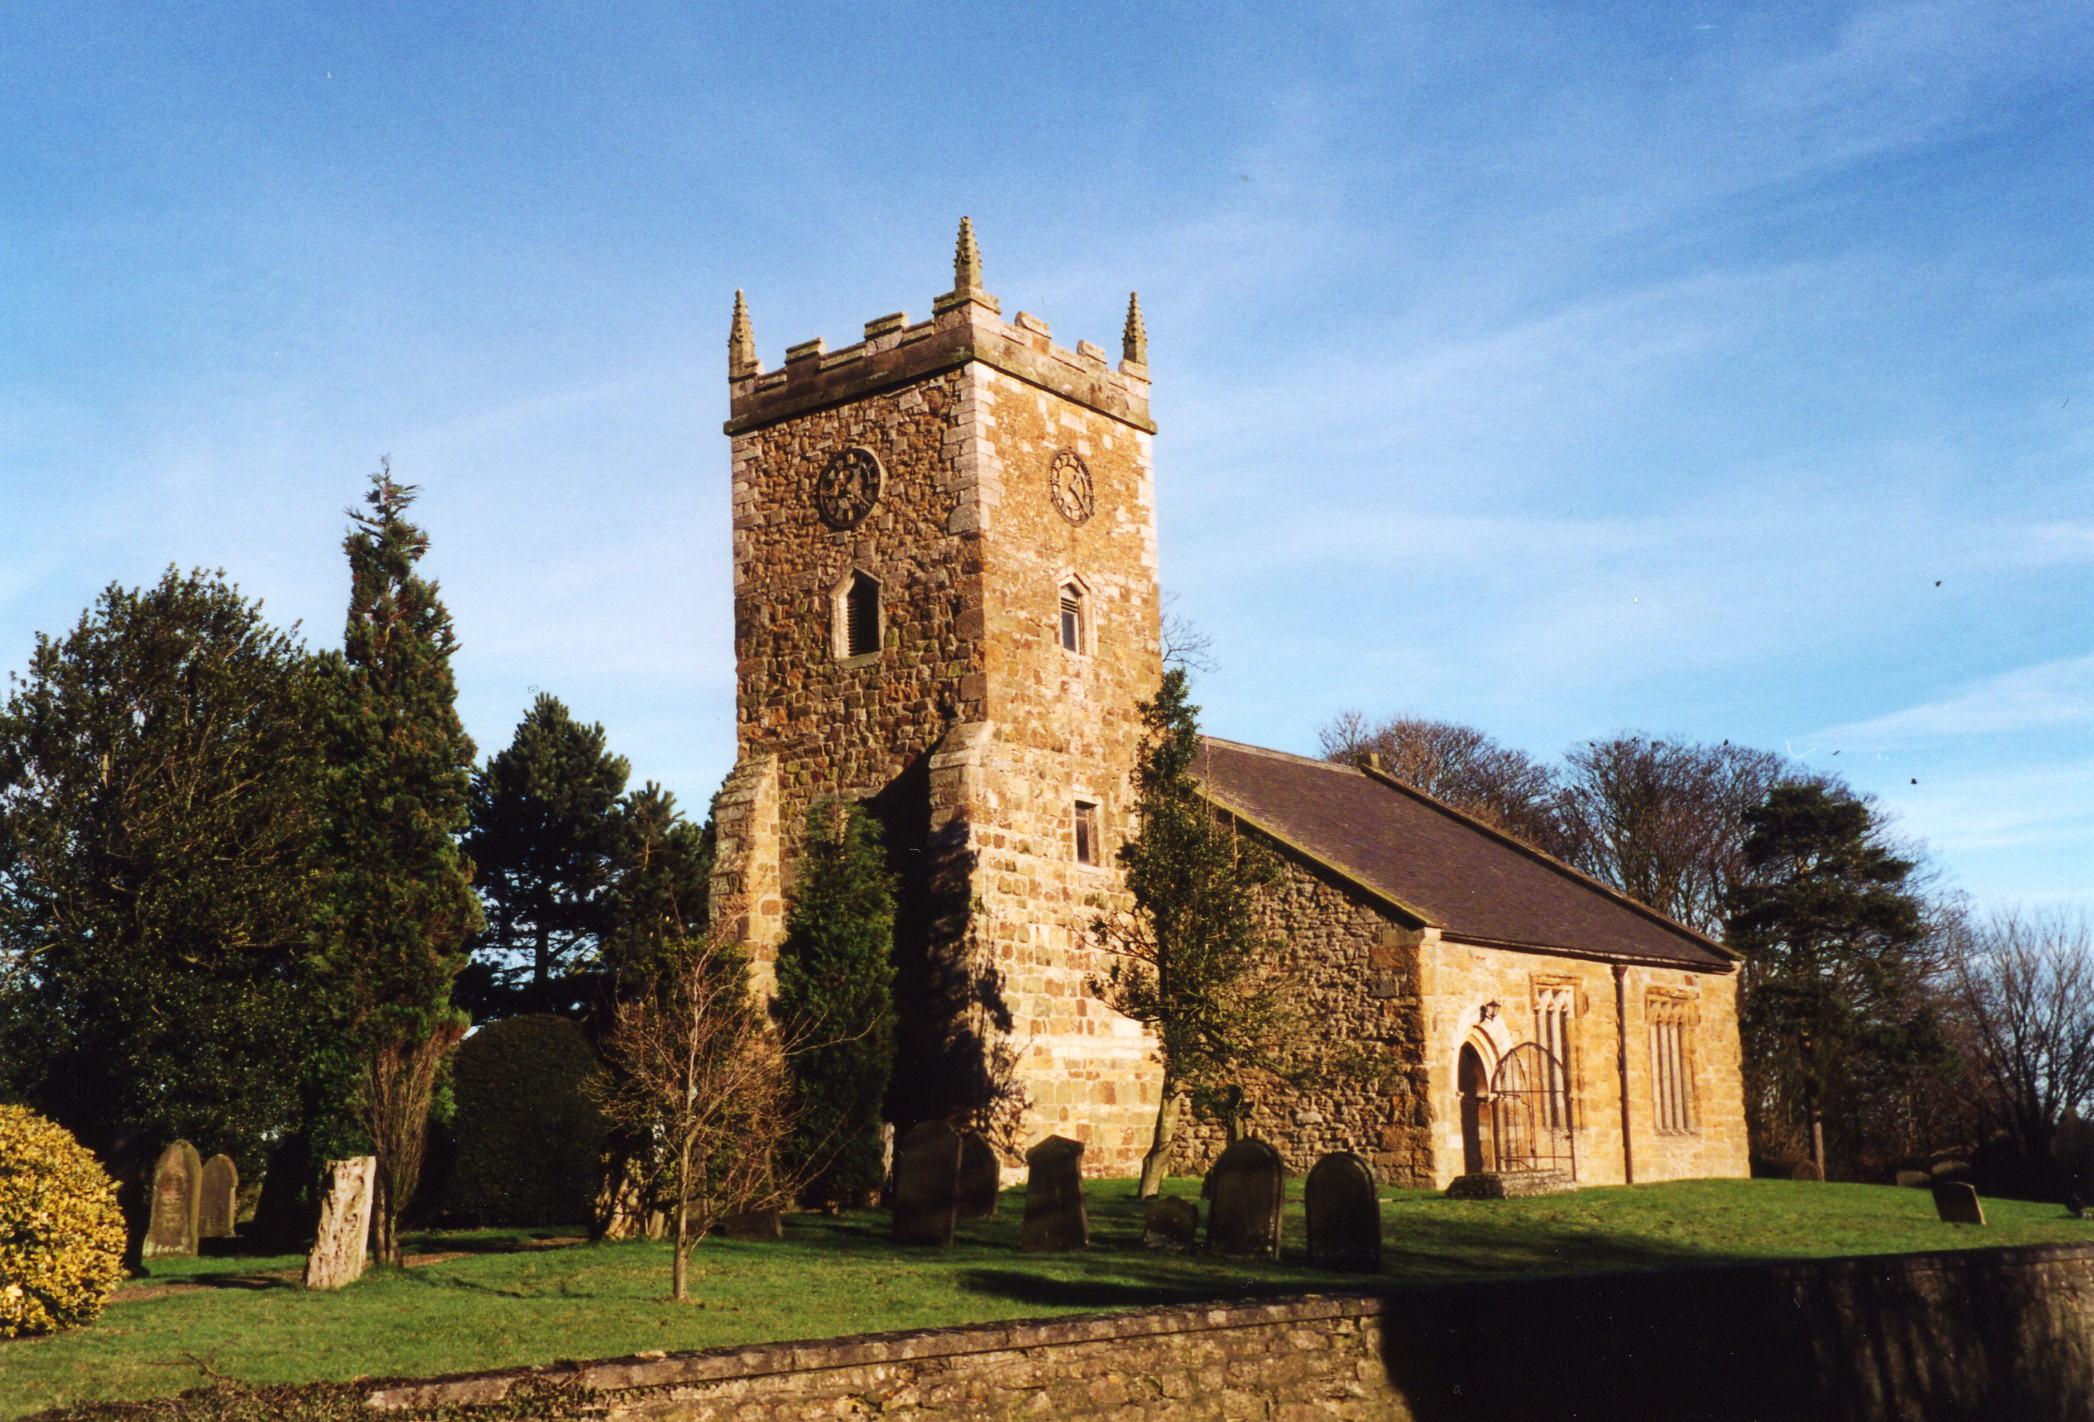 St. Helen's parish church